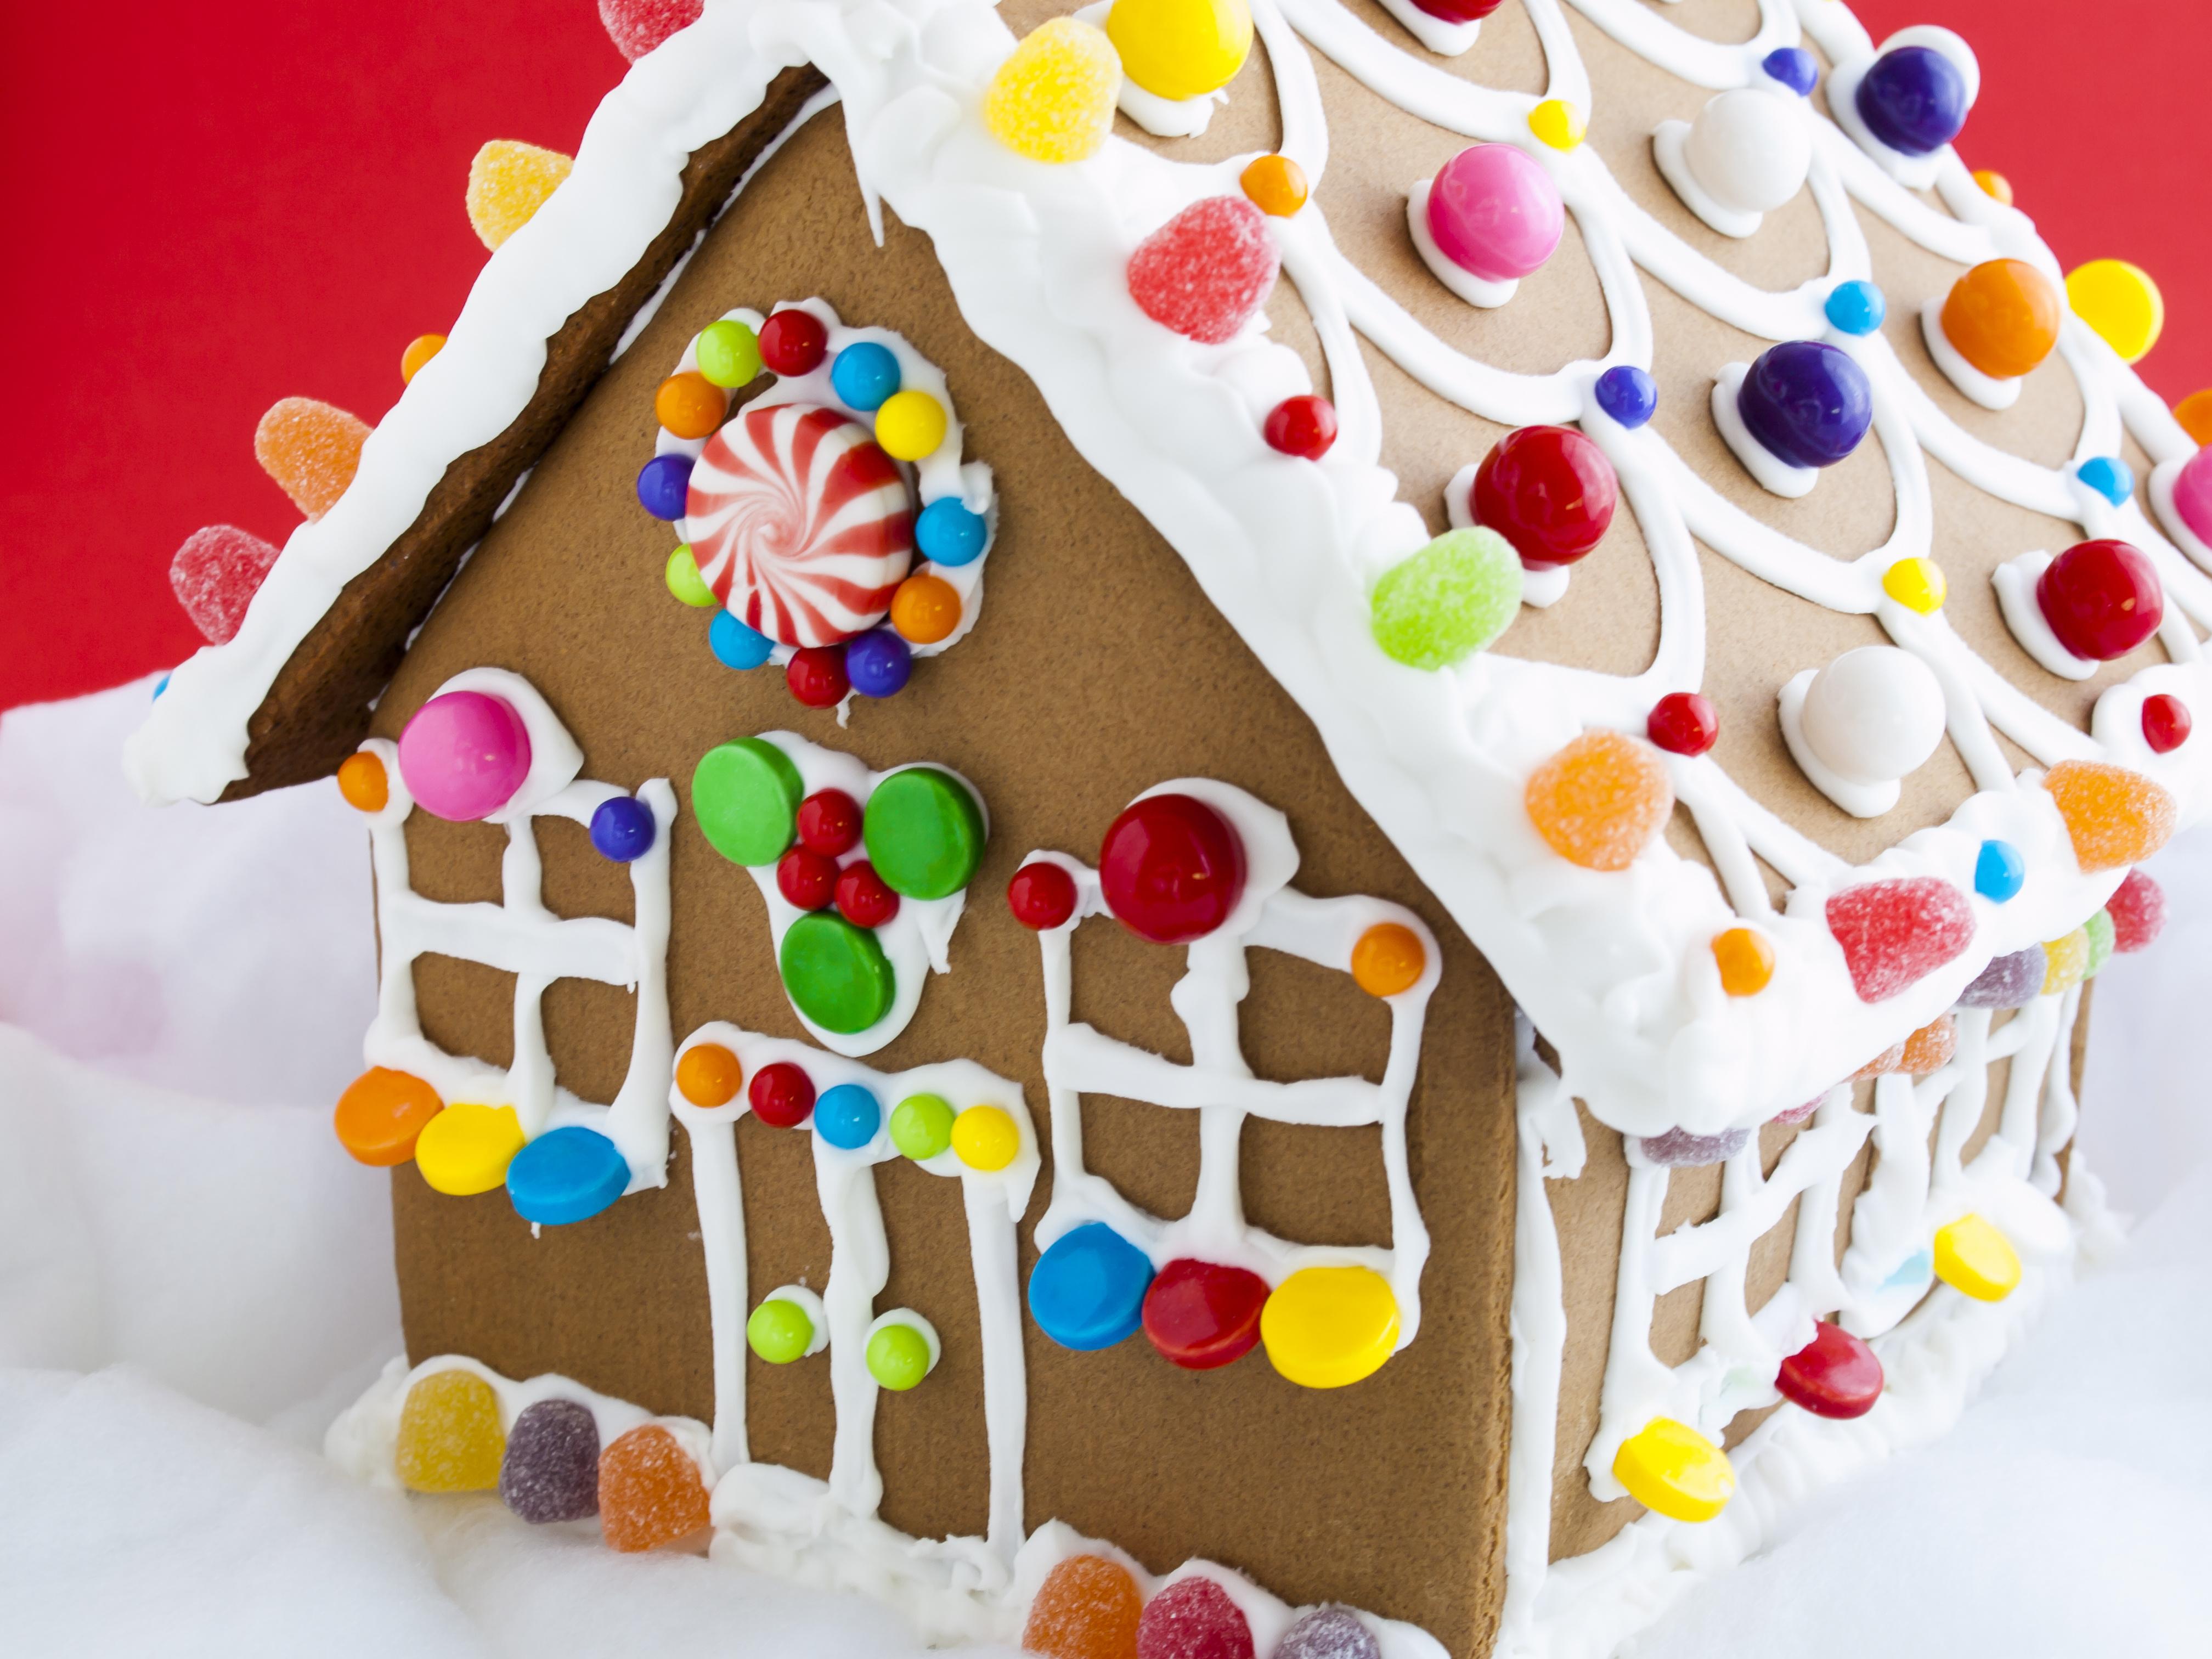 Floridatours.com Gingerbread House